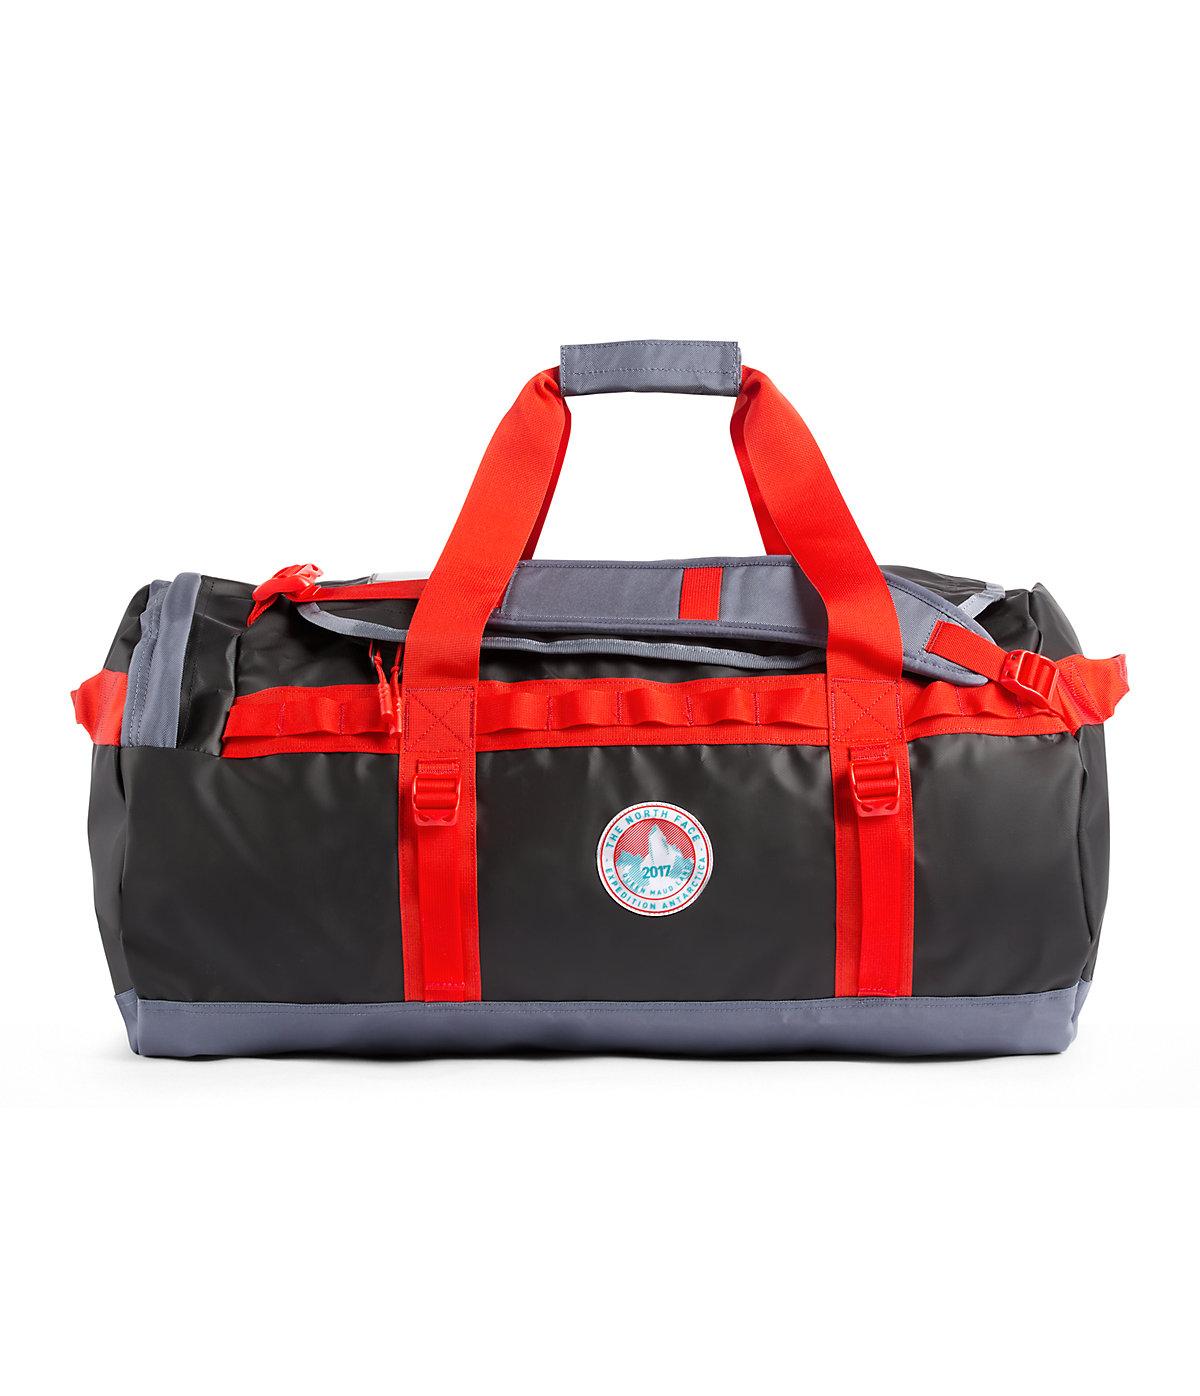 Eastern Mountain Sports Duffel Bag | Fitzpatrick Painting